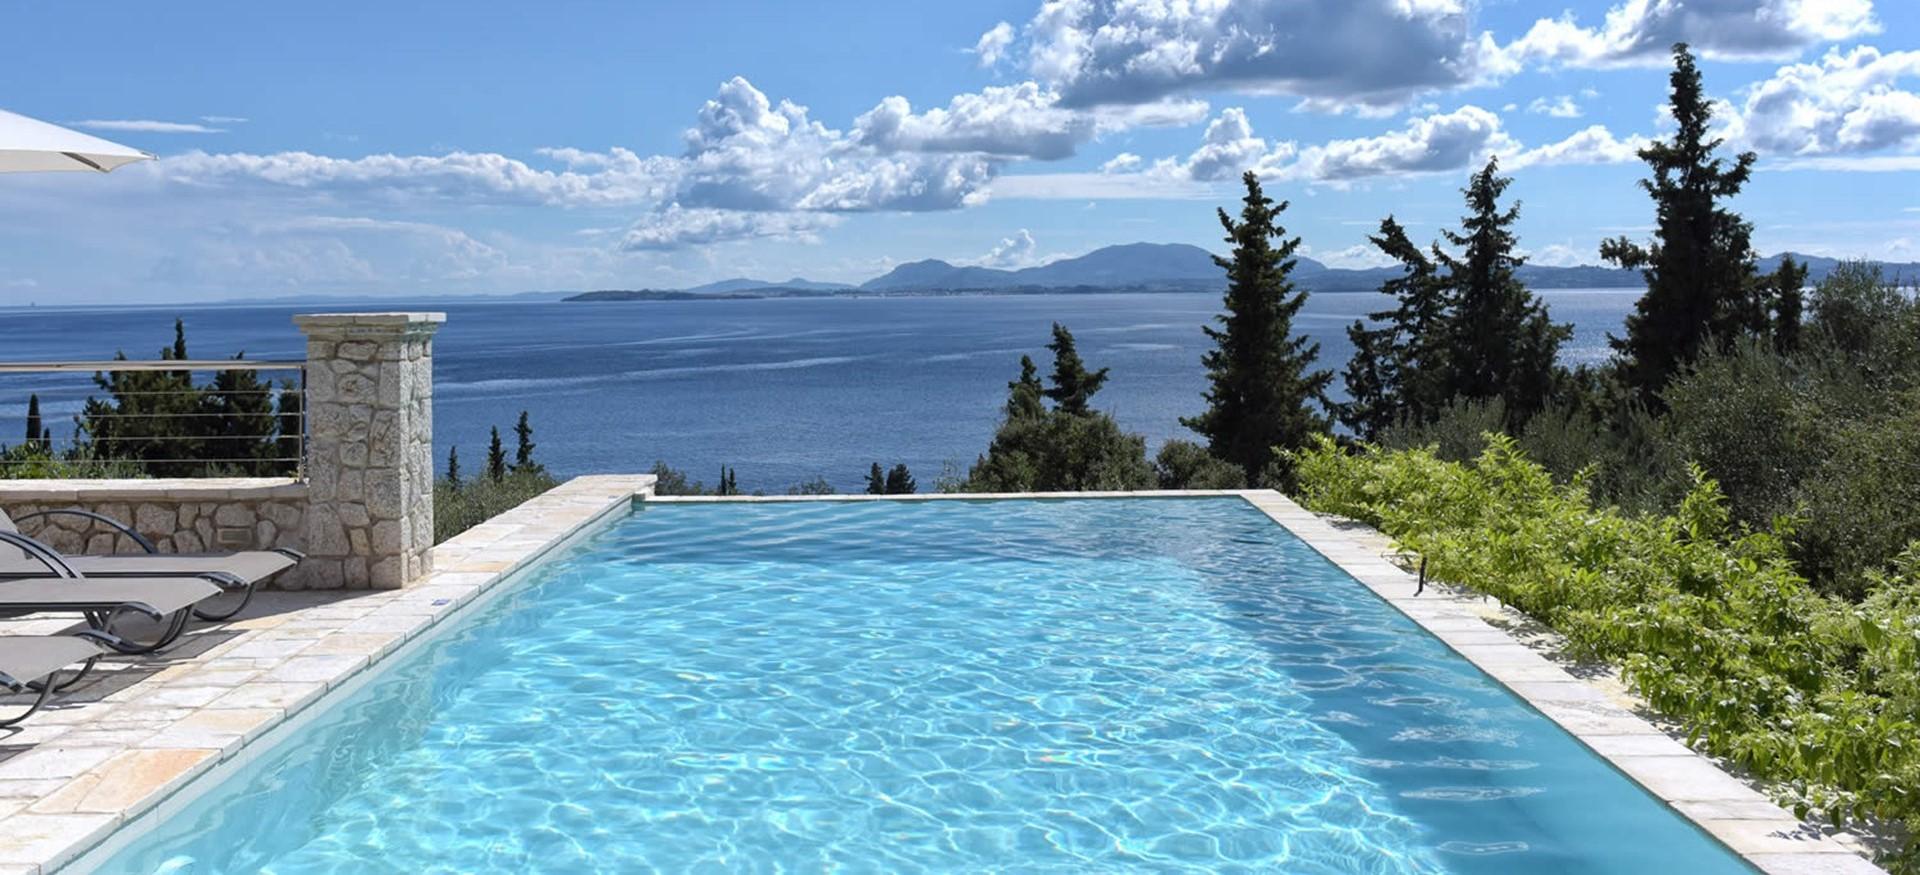 nissaki-house-corfu-pool-view